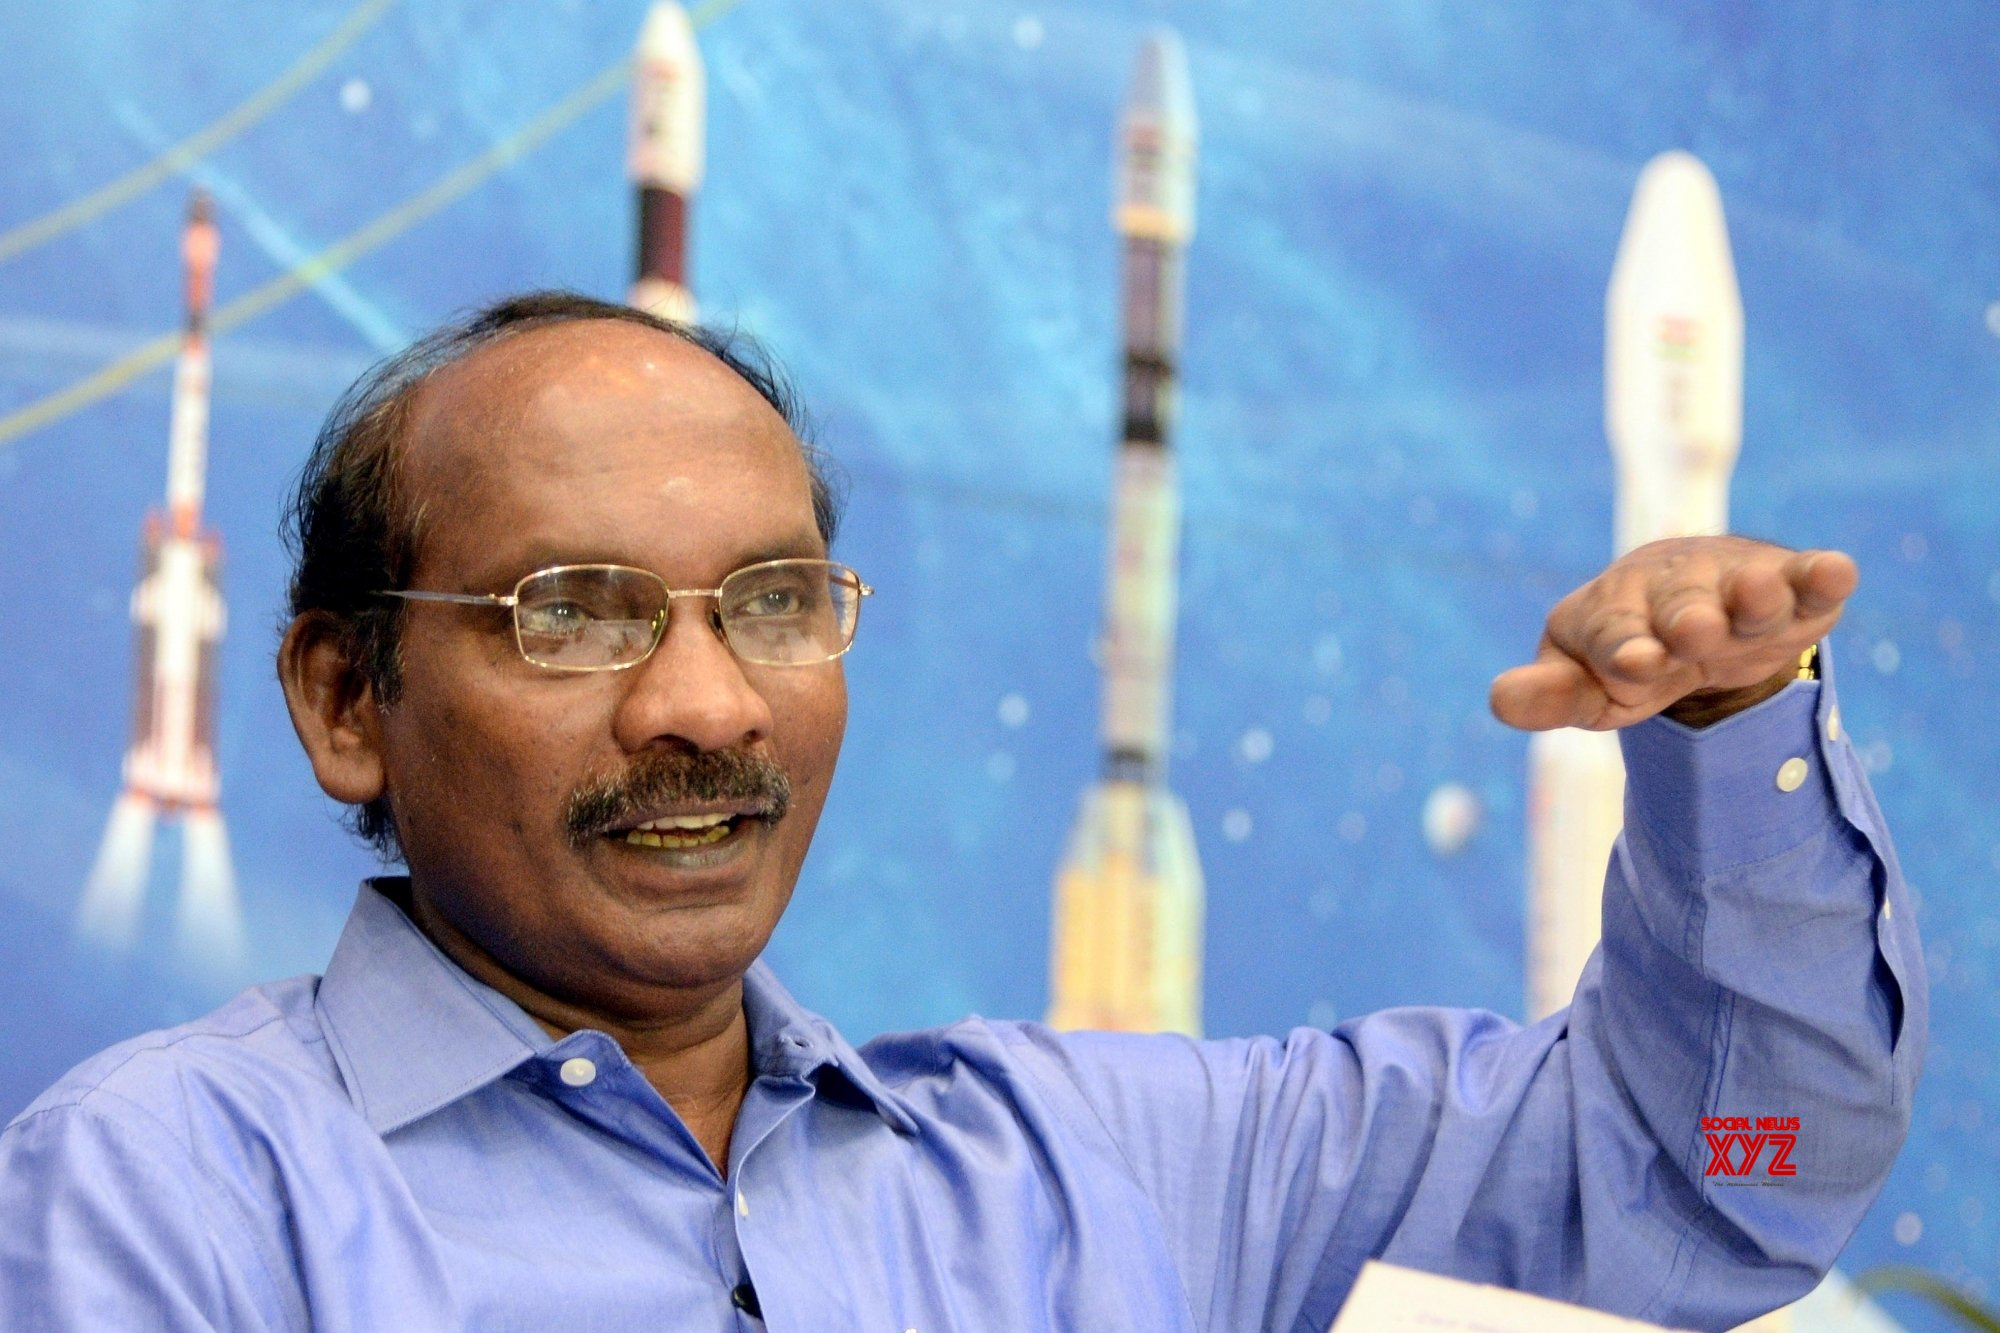 We located crashed Vikram lander first, says ISRO chief